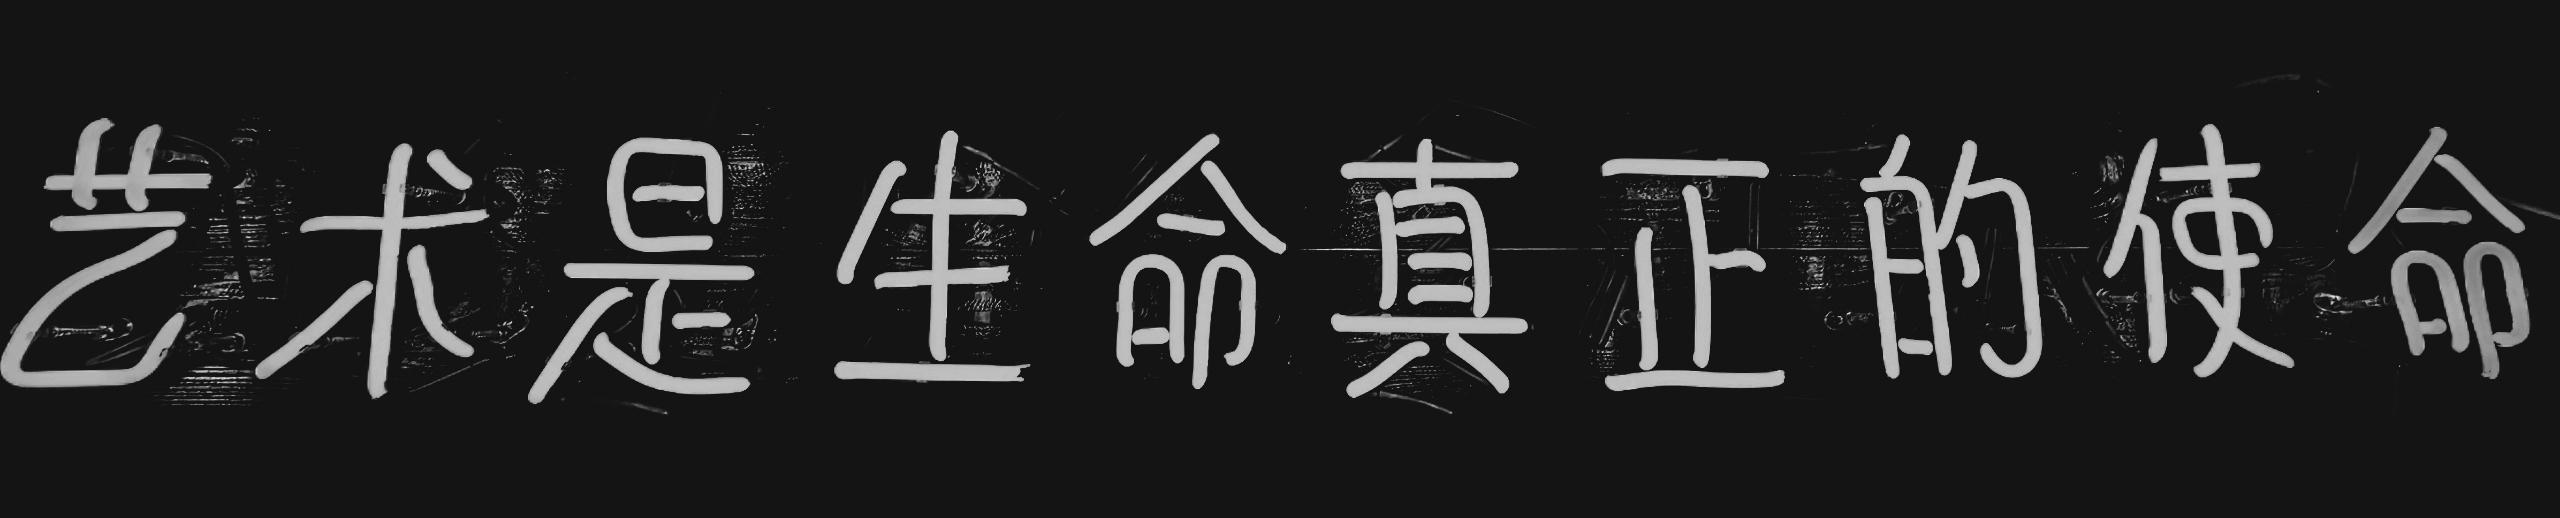 XI HUANG (@xihuang) Cover Image